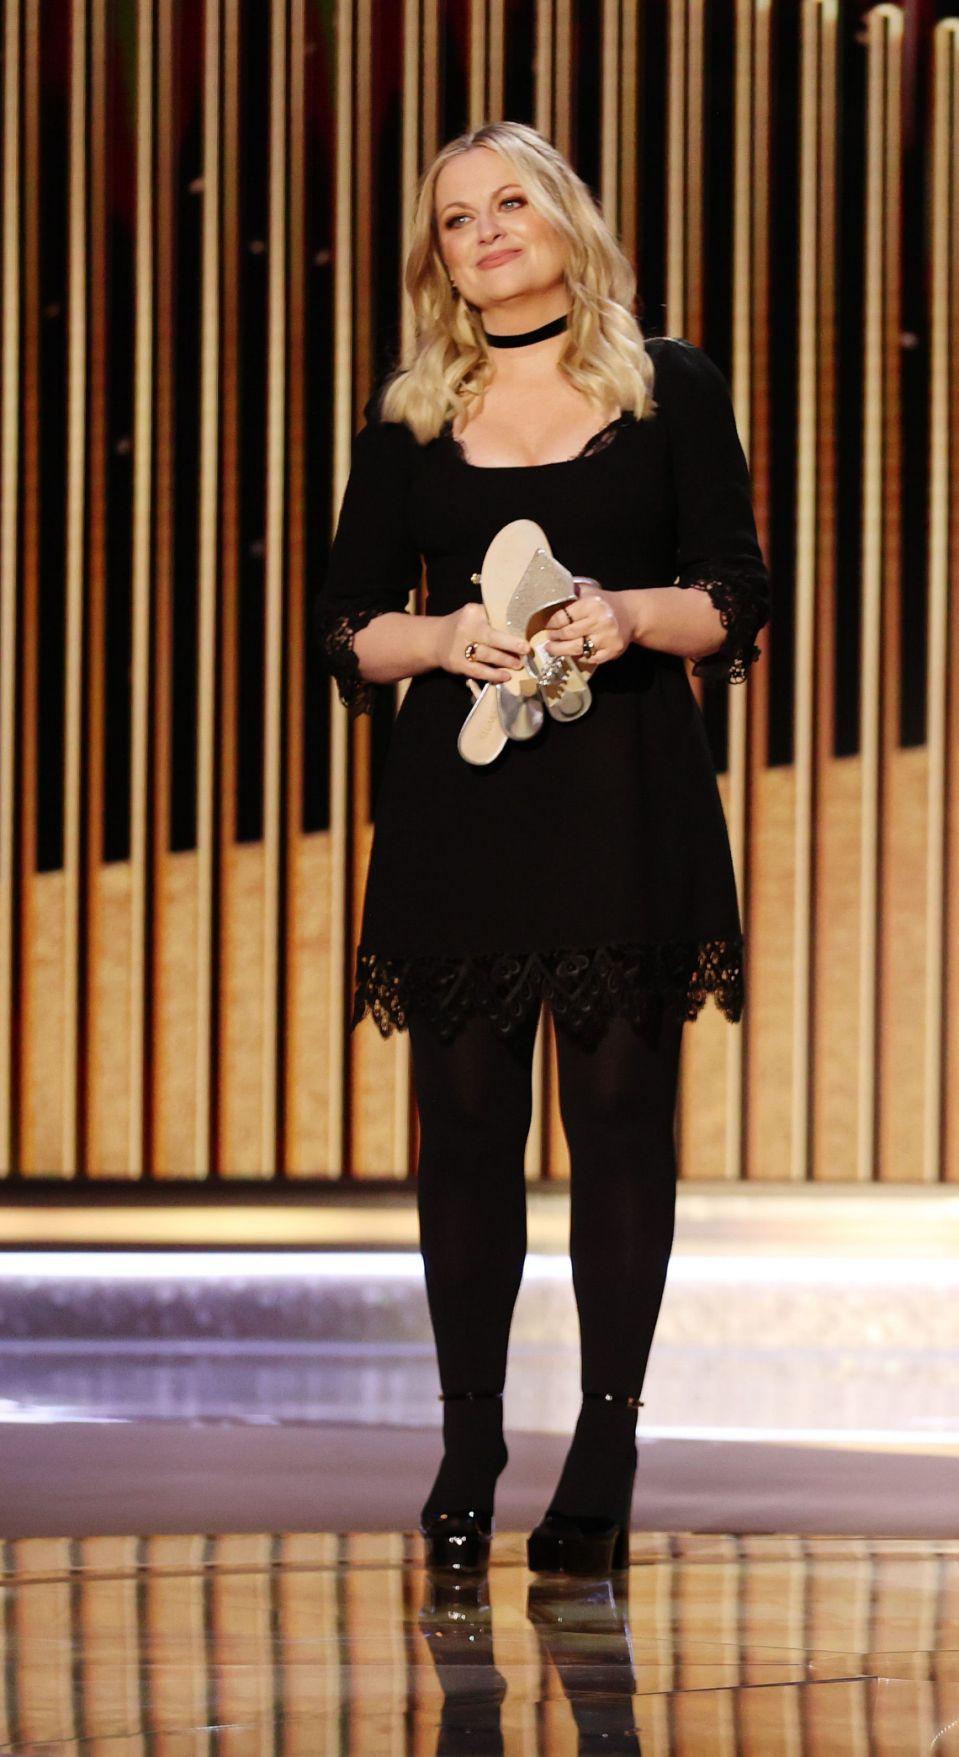 amy-poehler-in-black-dress-hostiing-the-2021-golden-globe-awards